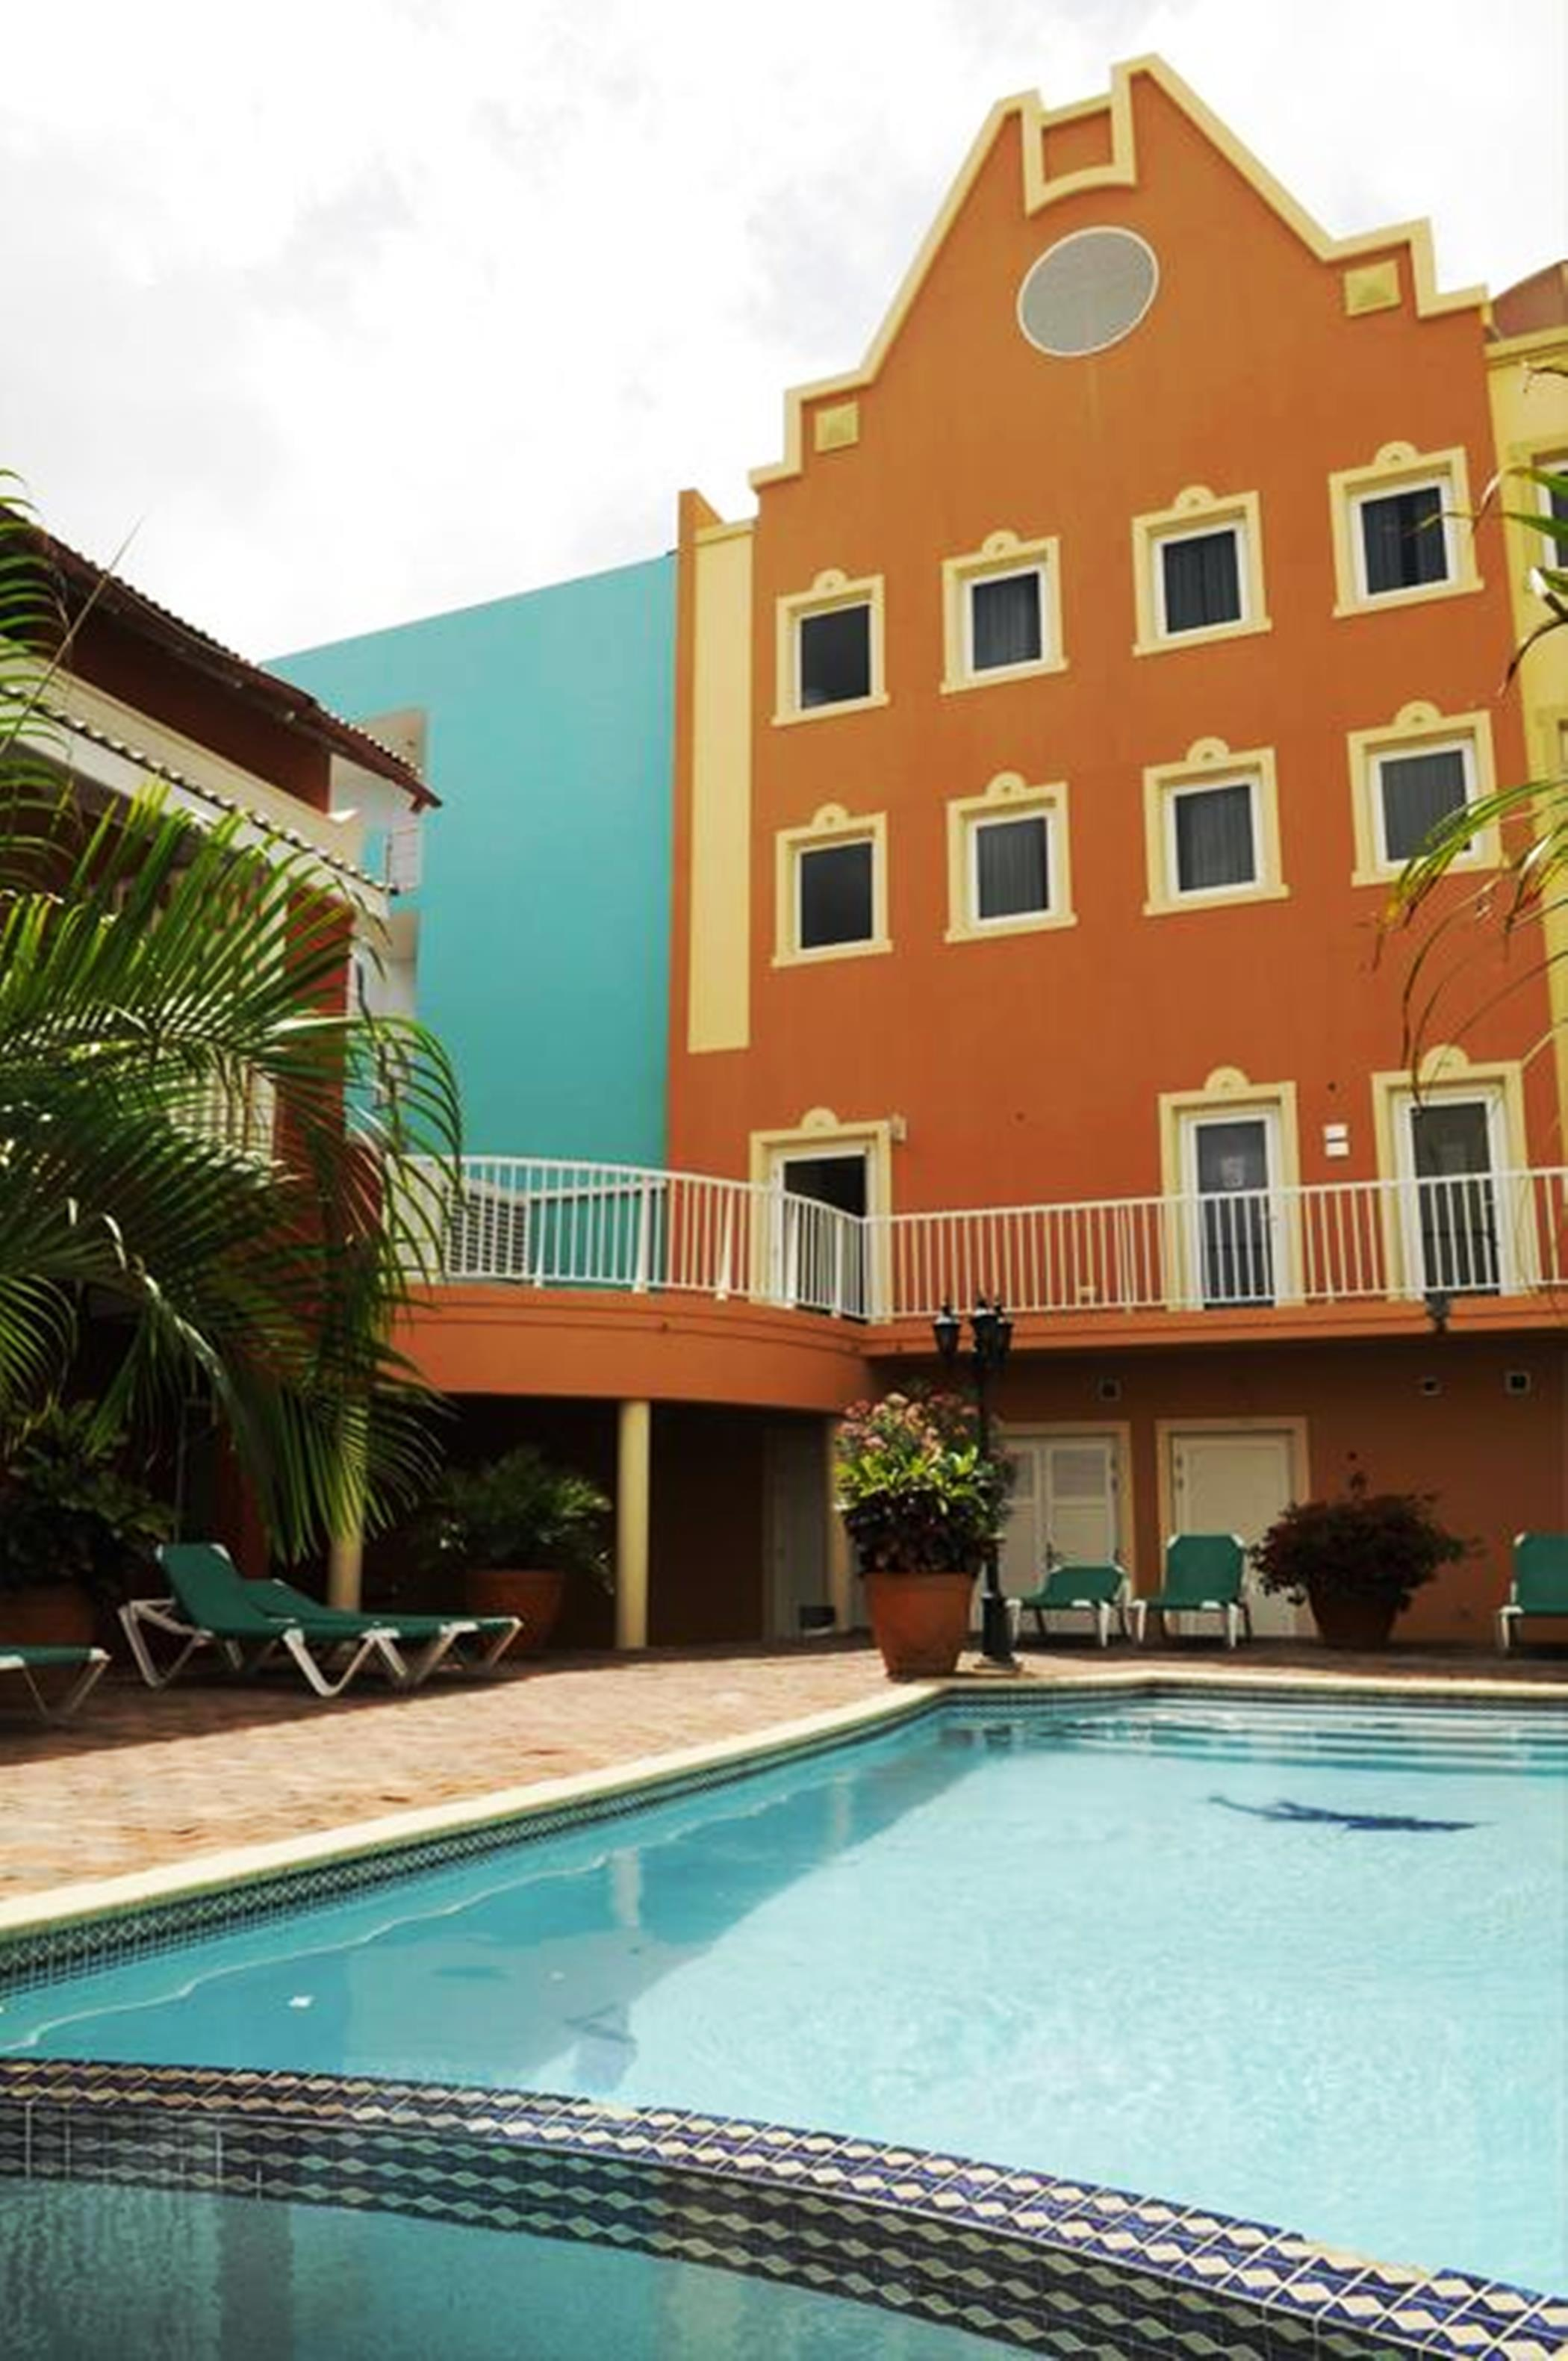 E M City Hotel Curacao,